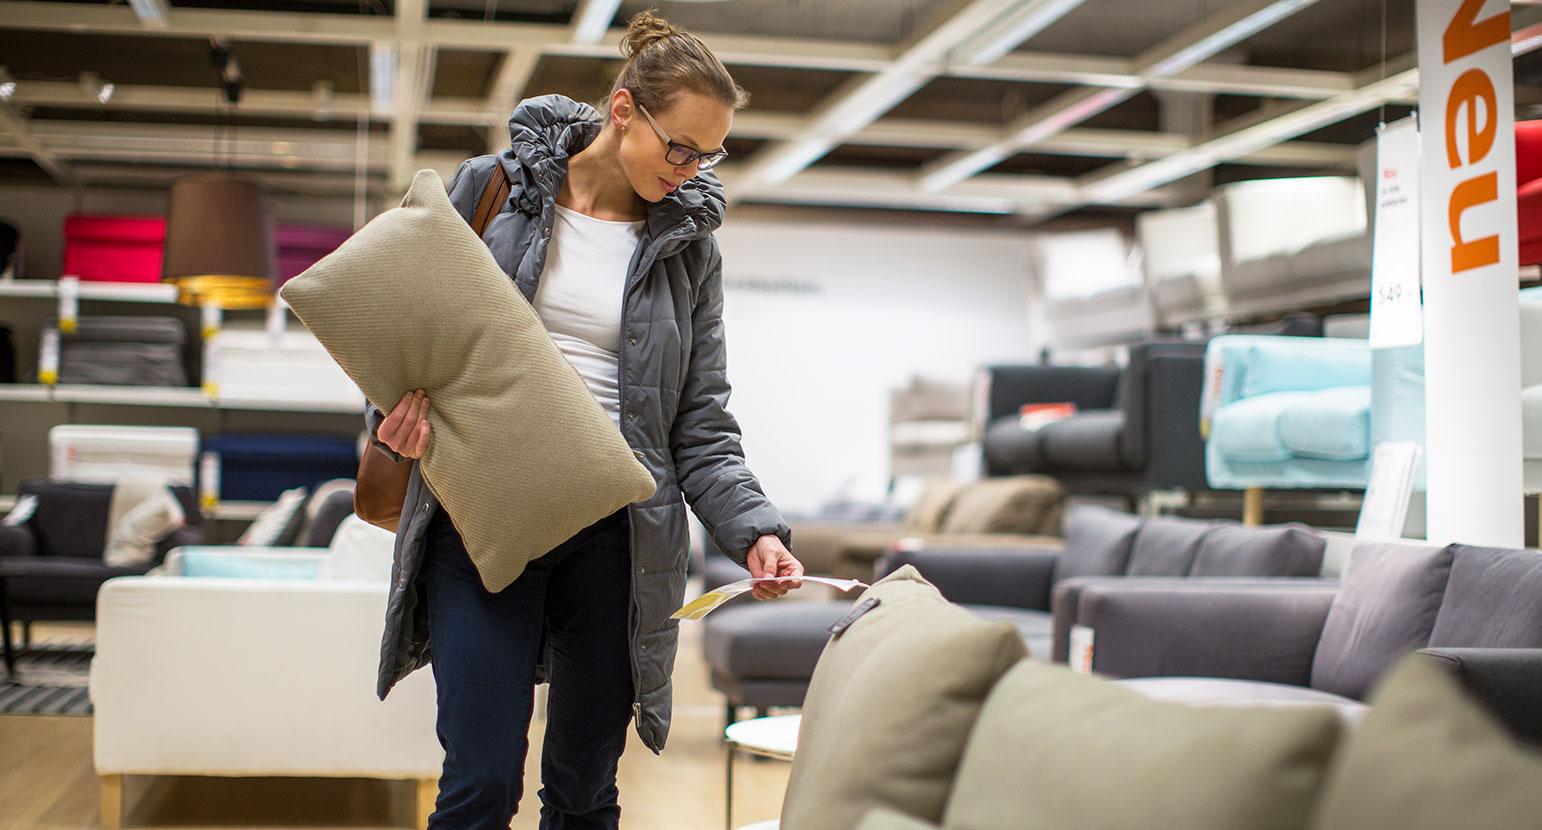 Woman shops at furniture shop